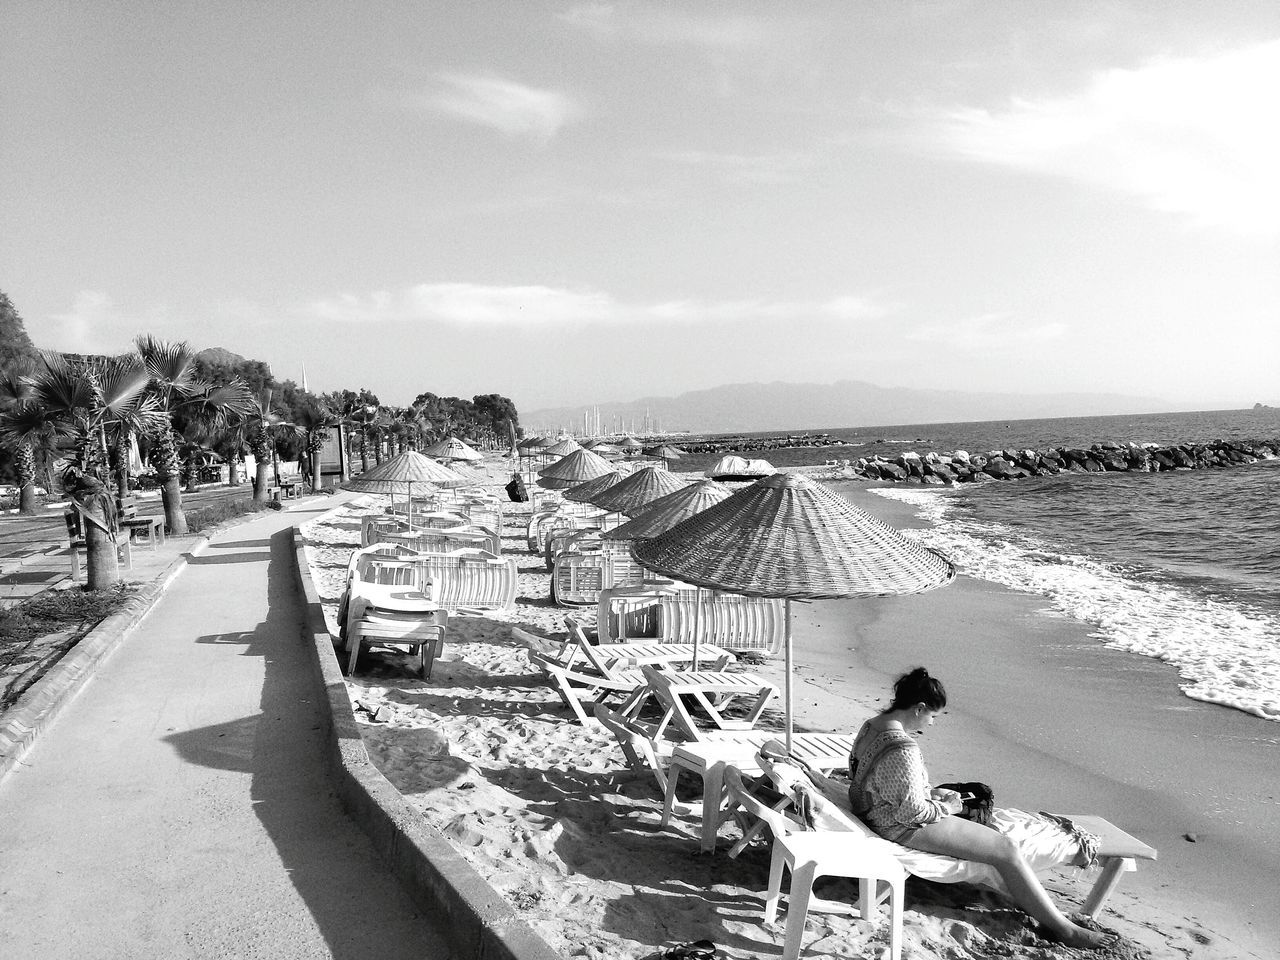 Eyem Türkiye Bodrum Turgutreis Shades Of Grey Summer Views Seaside Samsungphotography S Mini Beachphotography